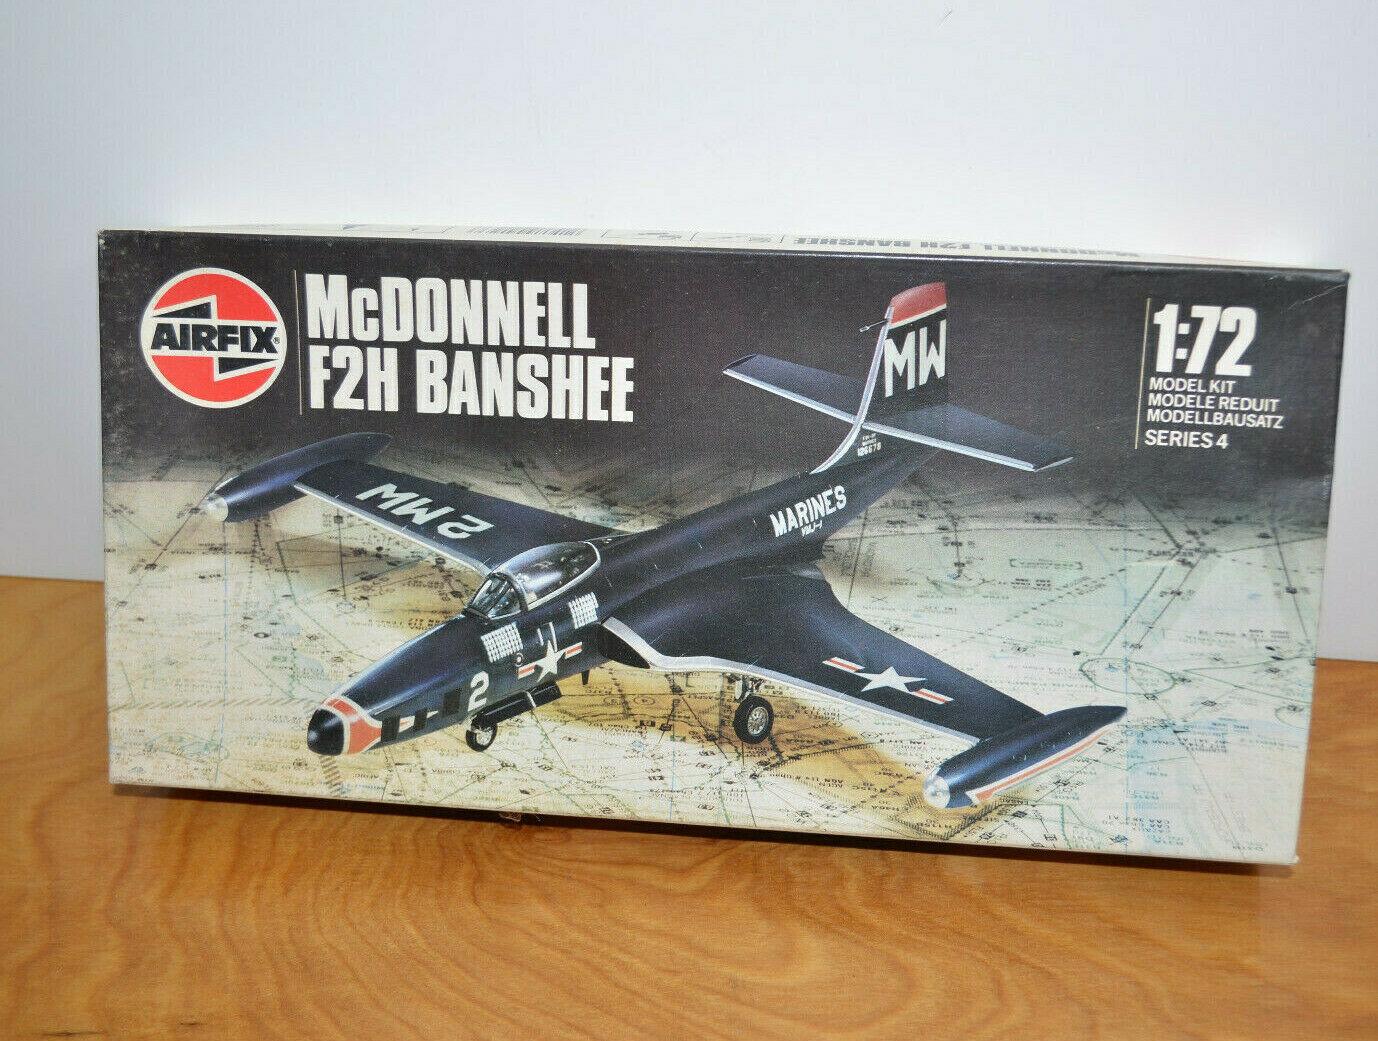 Airfix Model Kit (1980s): 1 listing